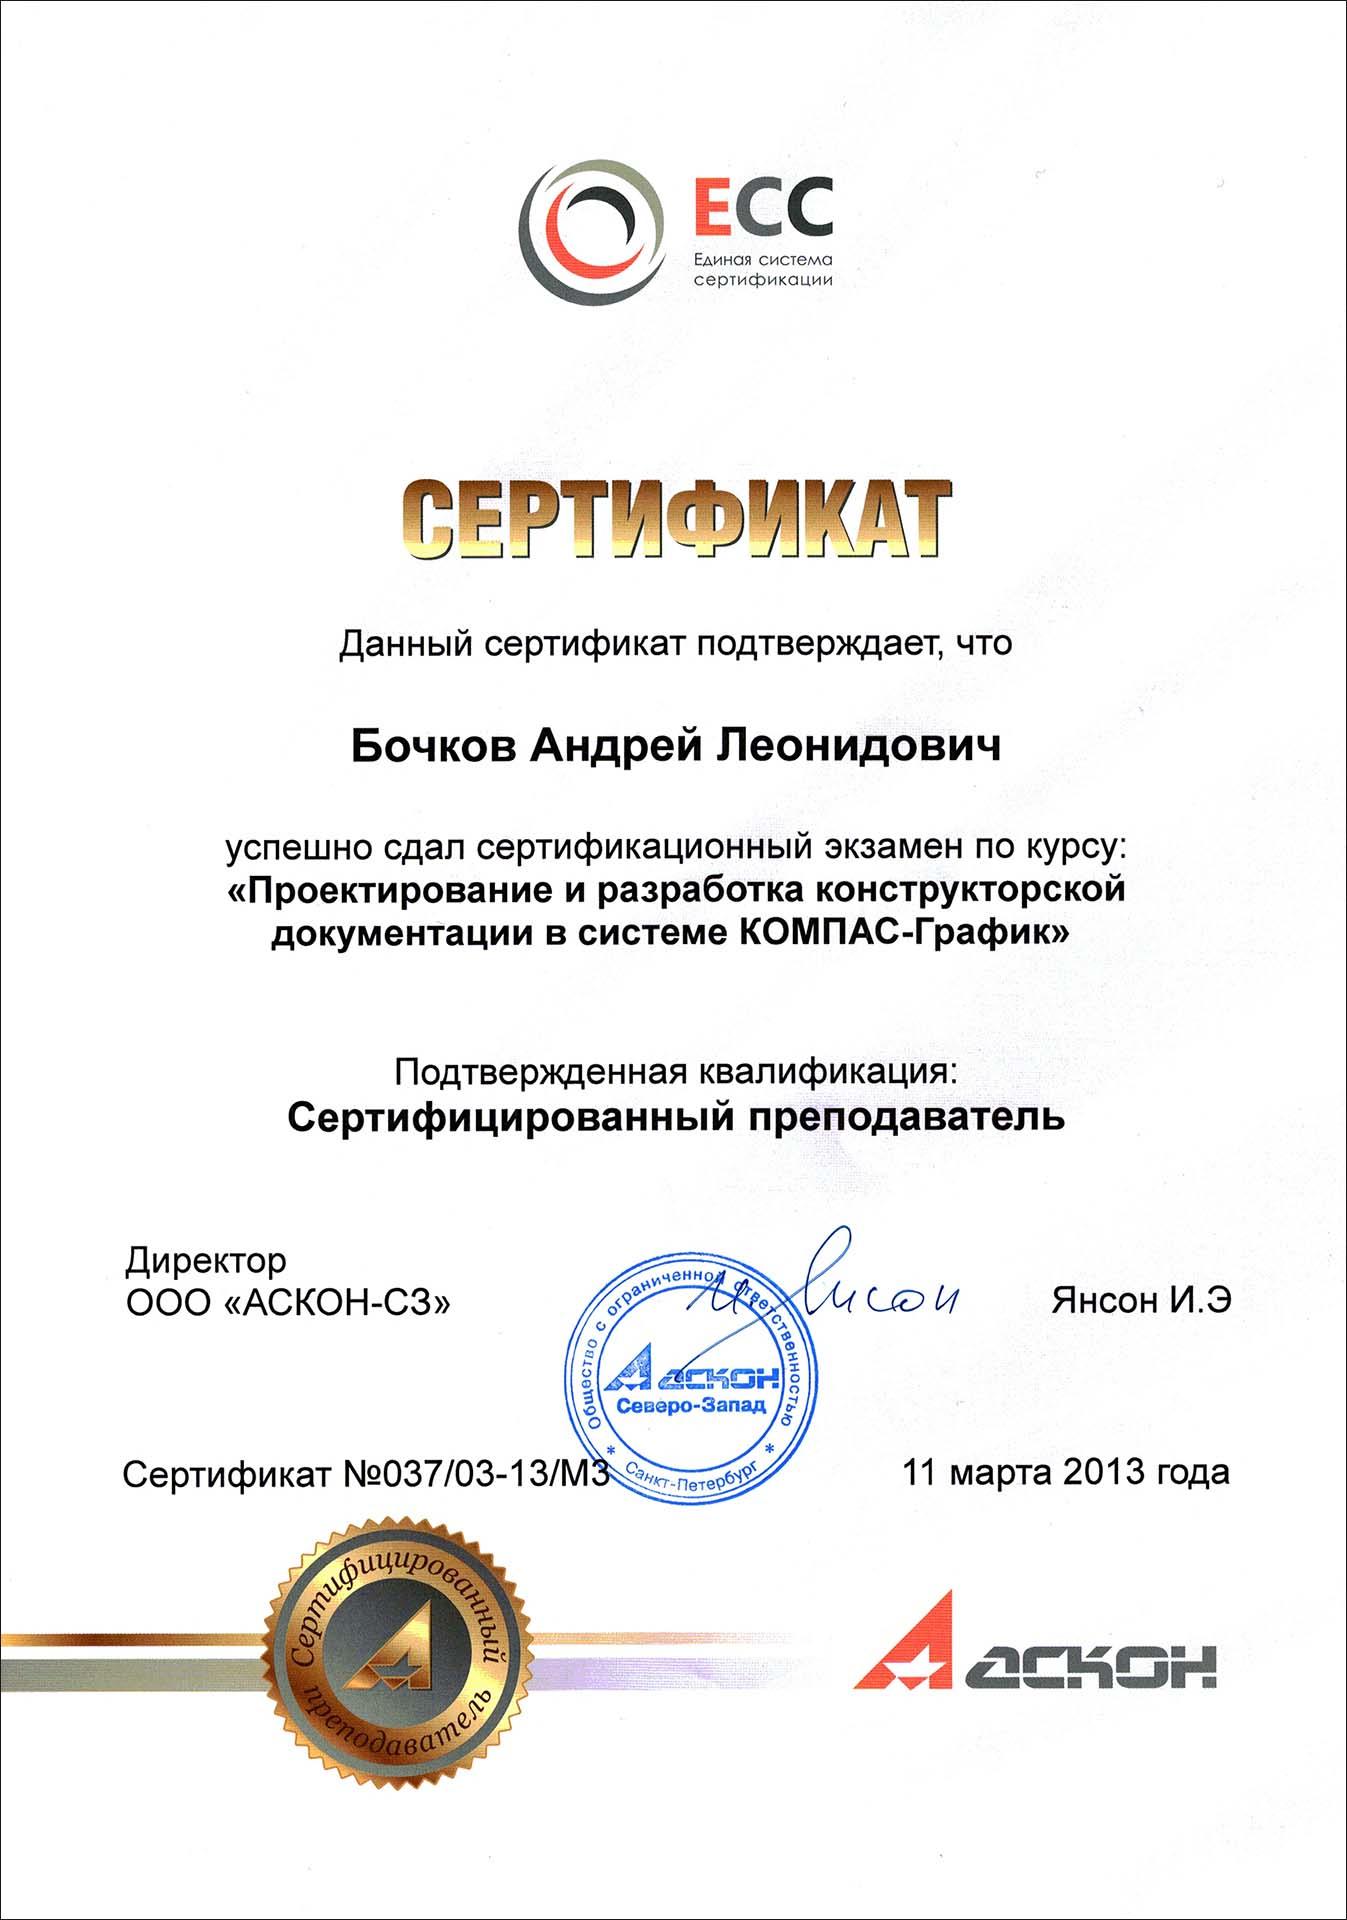 Сертификат КОМПАС-График